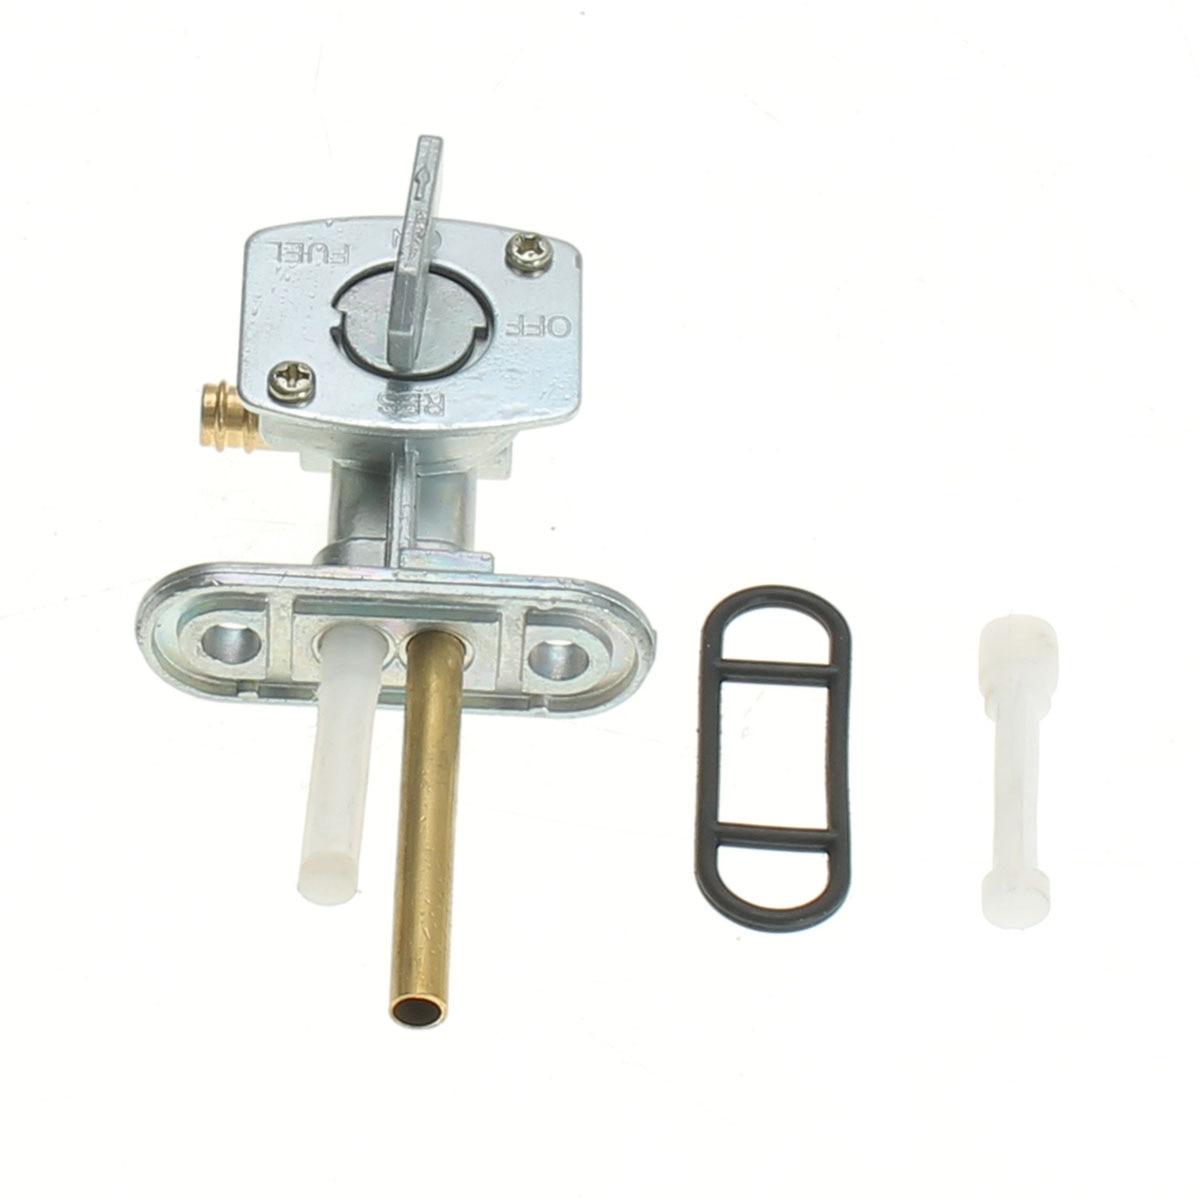 Motorcycle Gas Fuel Petcock Tap Valve Switch Pump For Yamaha Blaster 200 YFS200 1988-2006 Metal Plastic